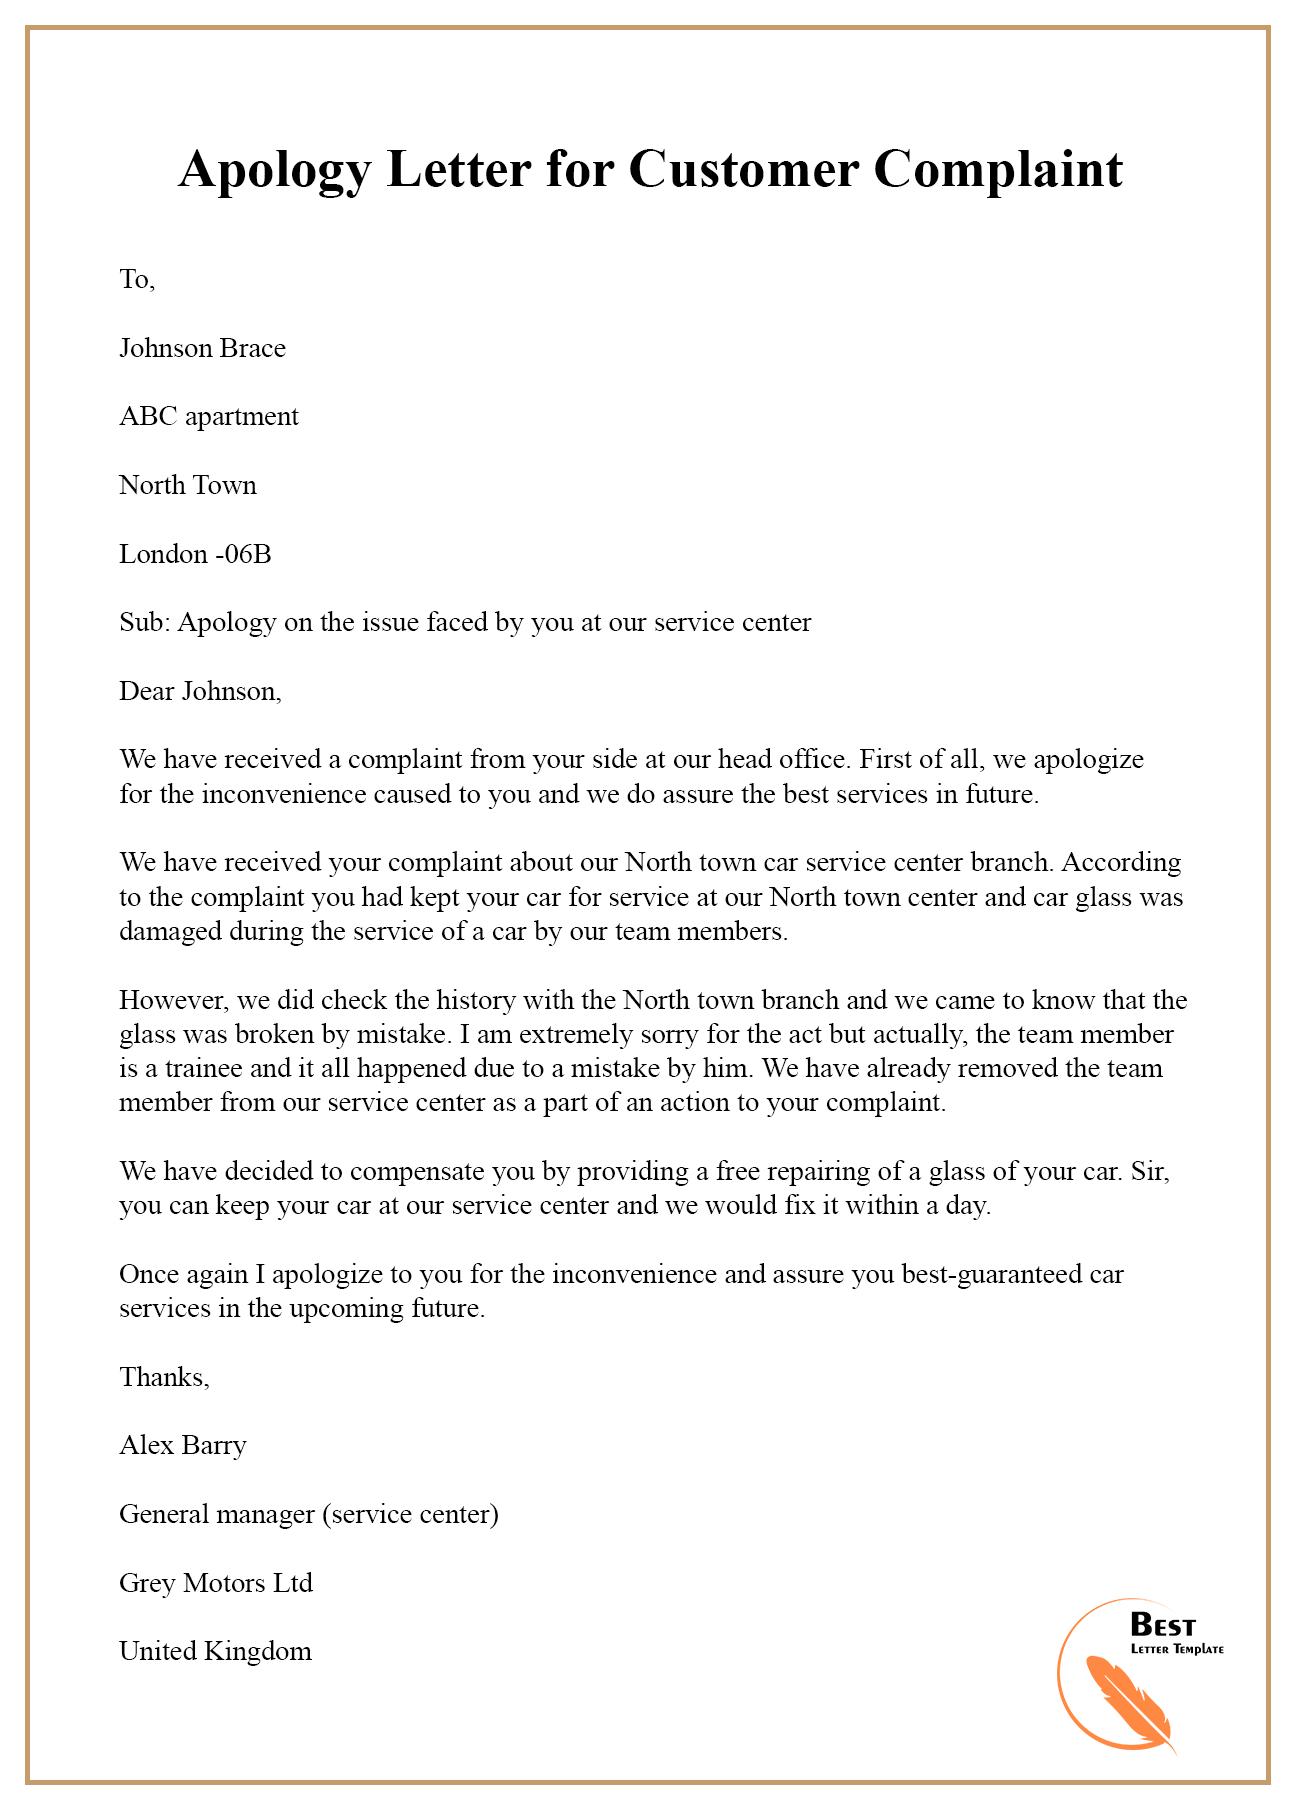 Apology-Letter-for-Customer-Complaint - Best Letter Template